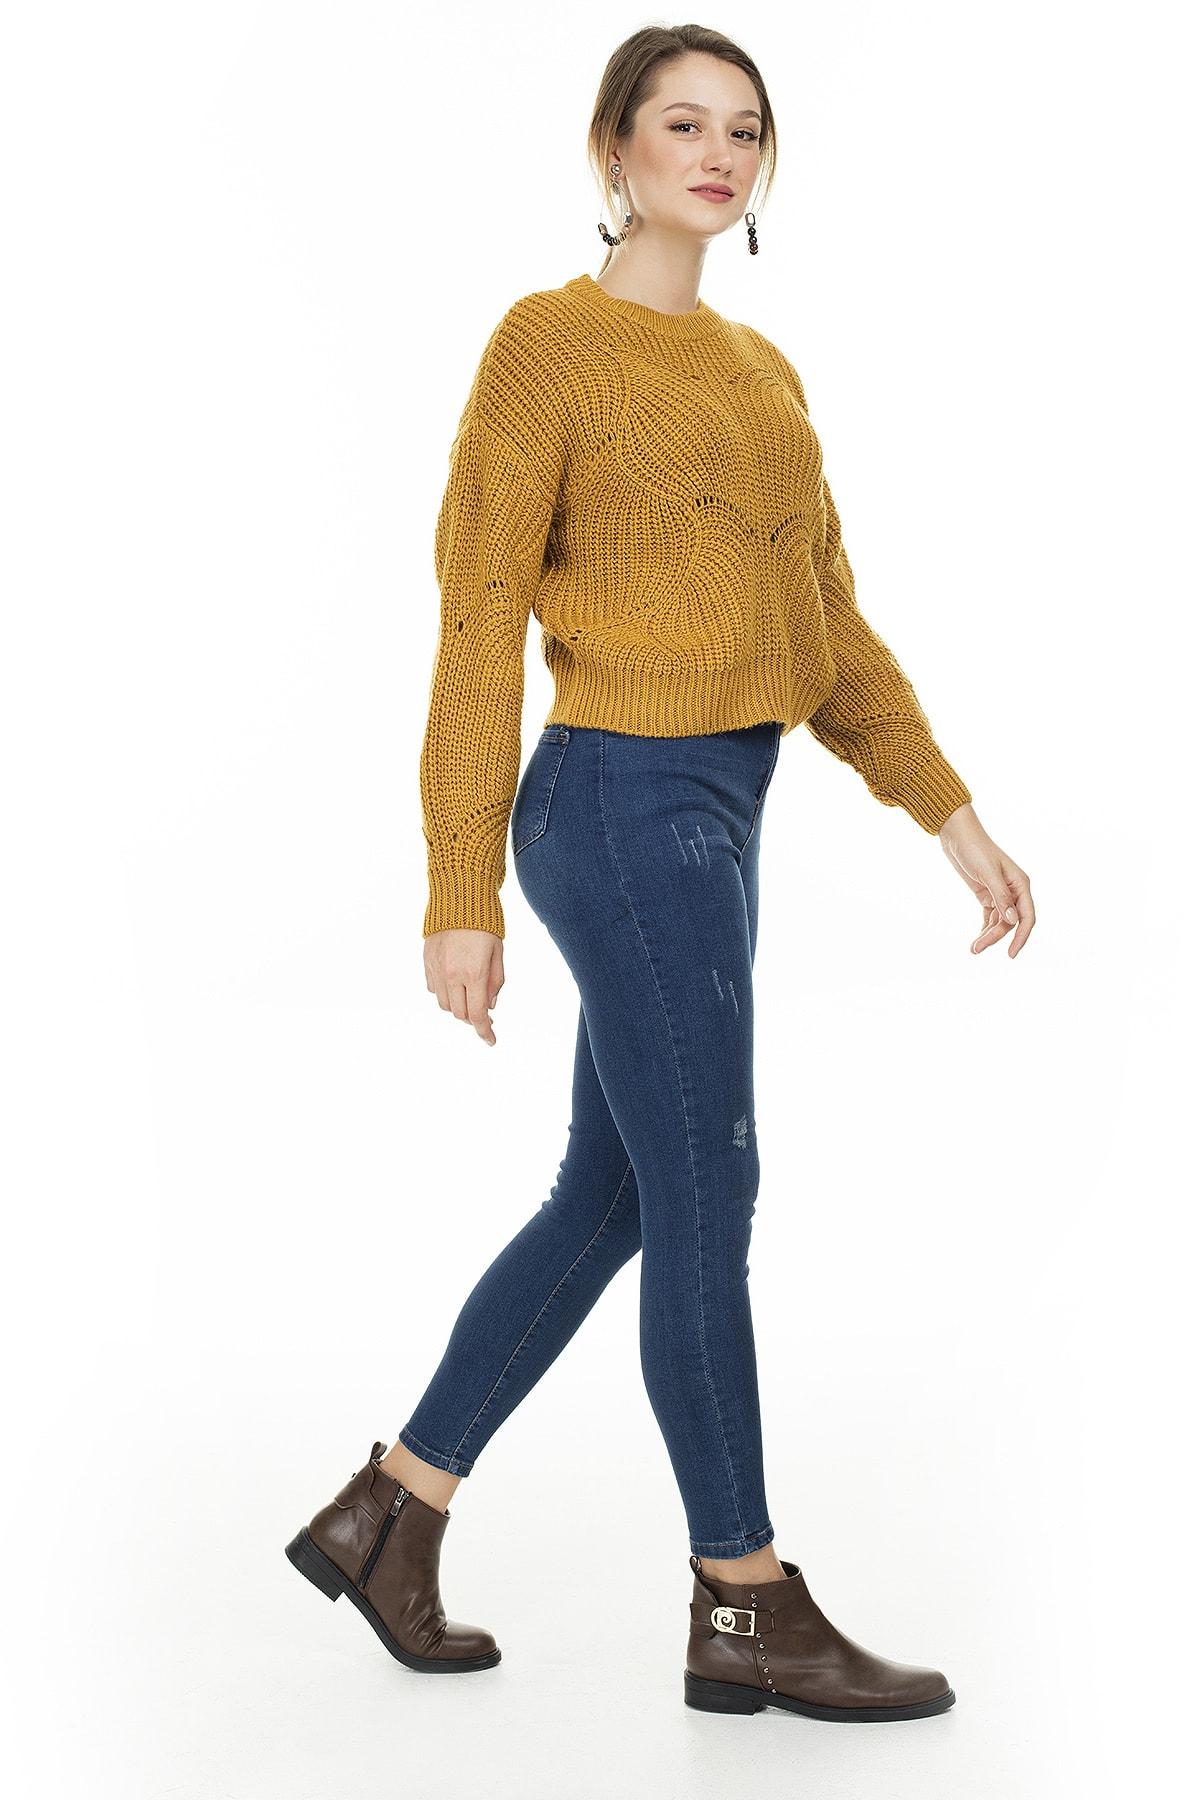 Lela Yüksek Bel Skinny Pamuklu Jeans KADIN KOT PANTOLON 58713259